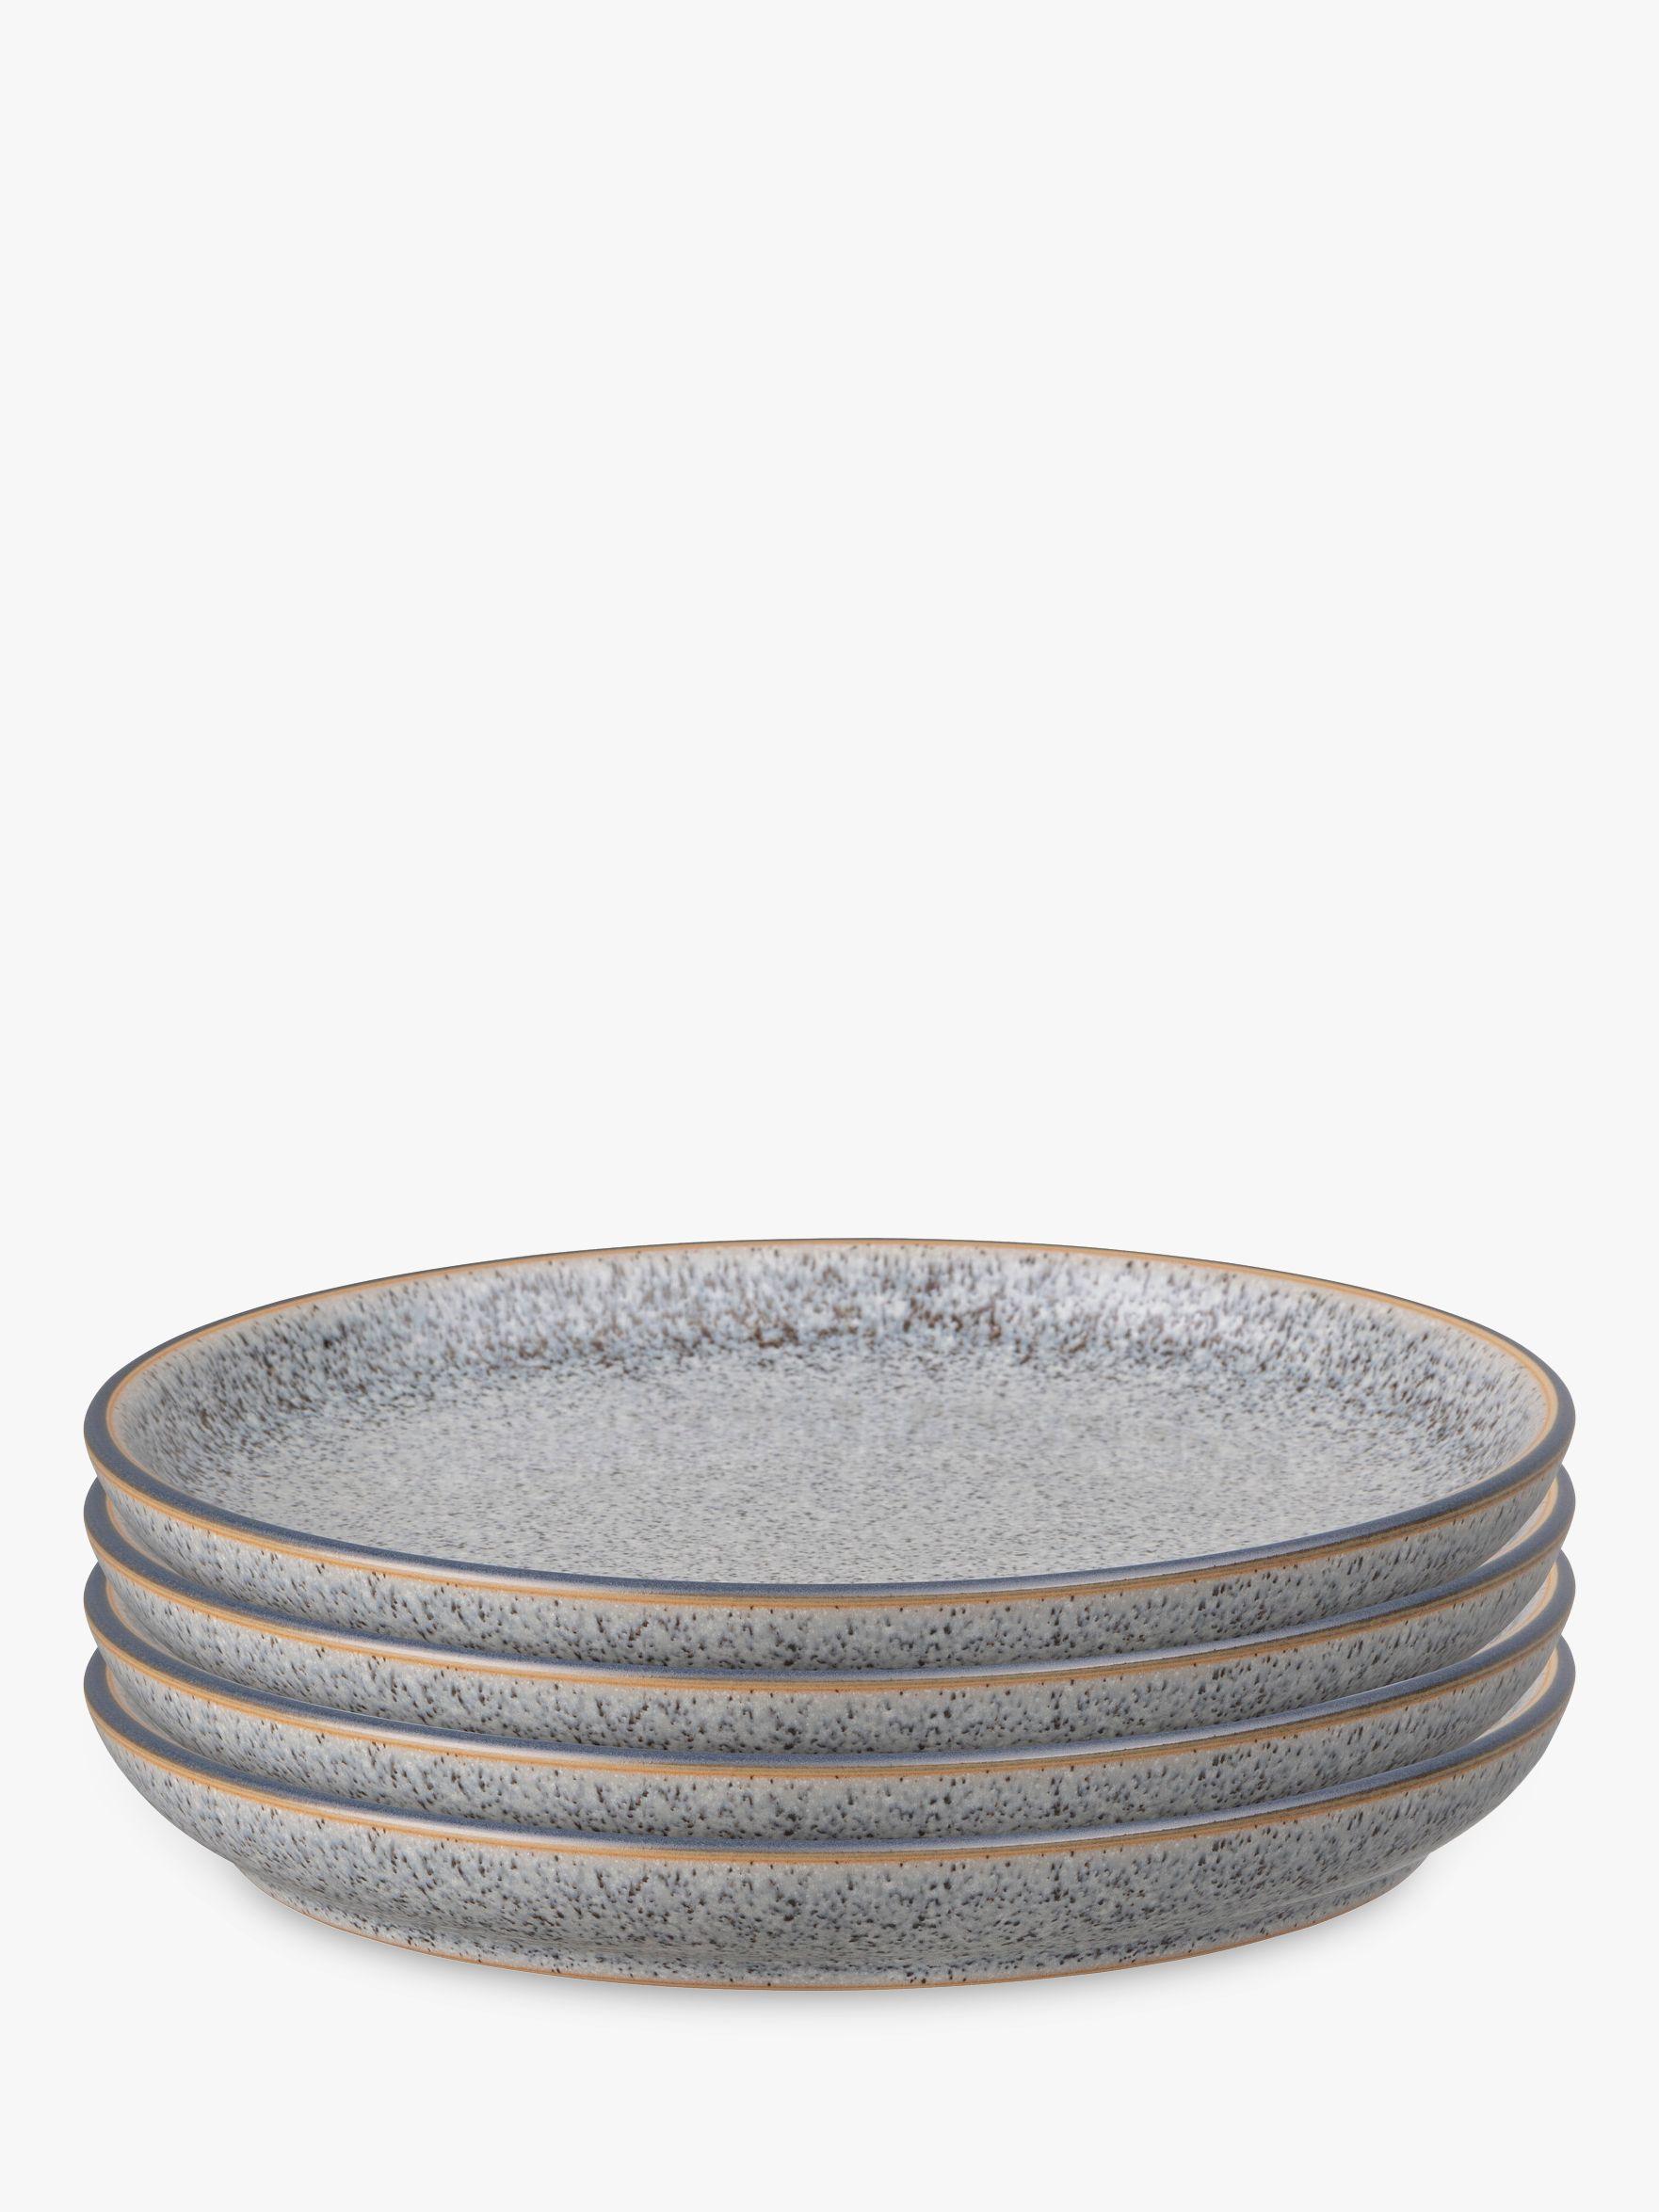 Denby Studio Grey Coupe Dinner Plates 26cm Set Of 4 At John Lewis Partners